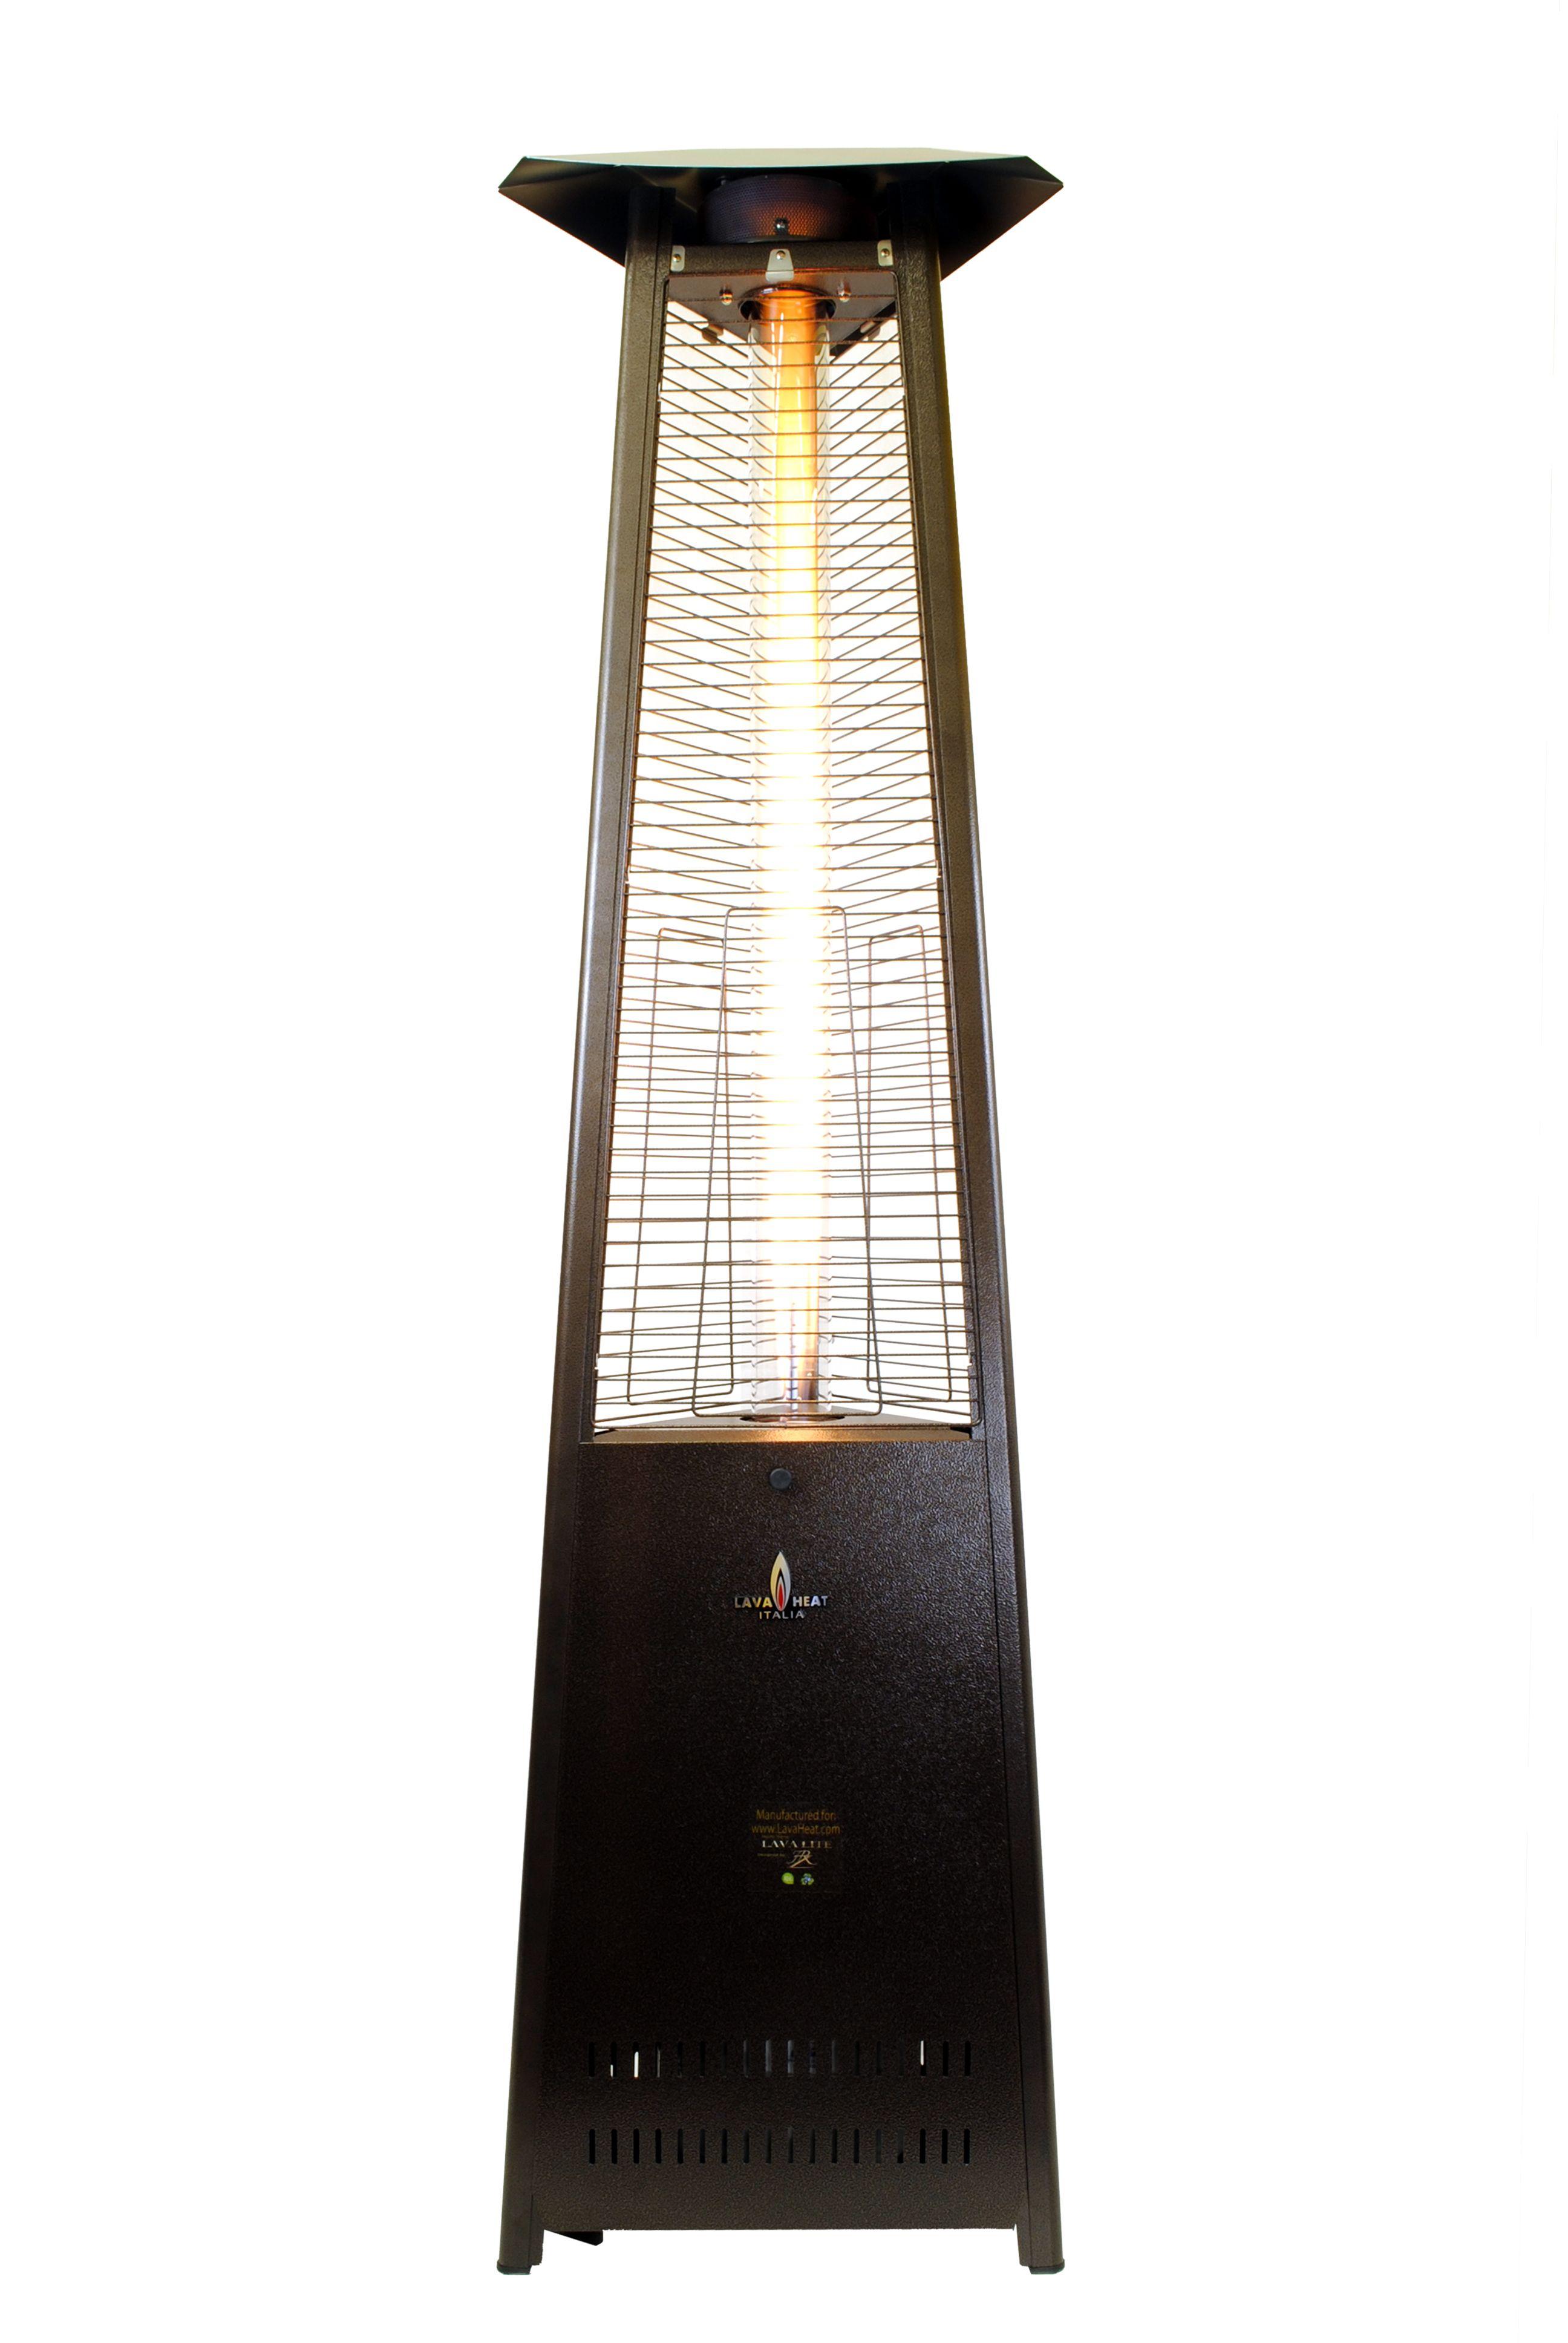 Lava Lite Propane Patio Heater Heritage Bronze Patio Heater Natural Gas Patio Heater Propane Patio Heater